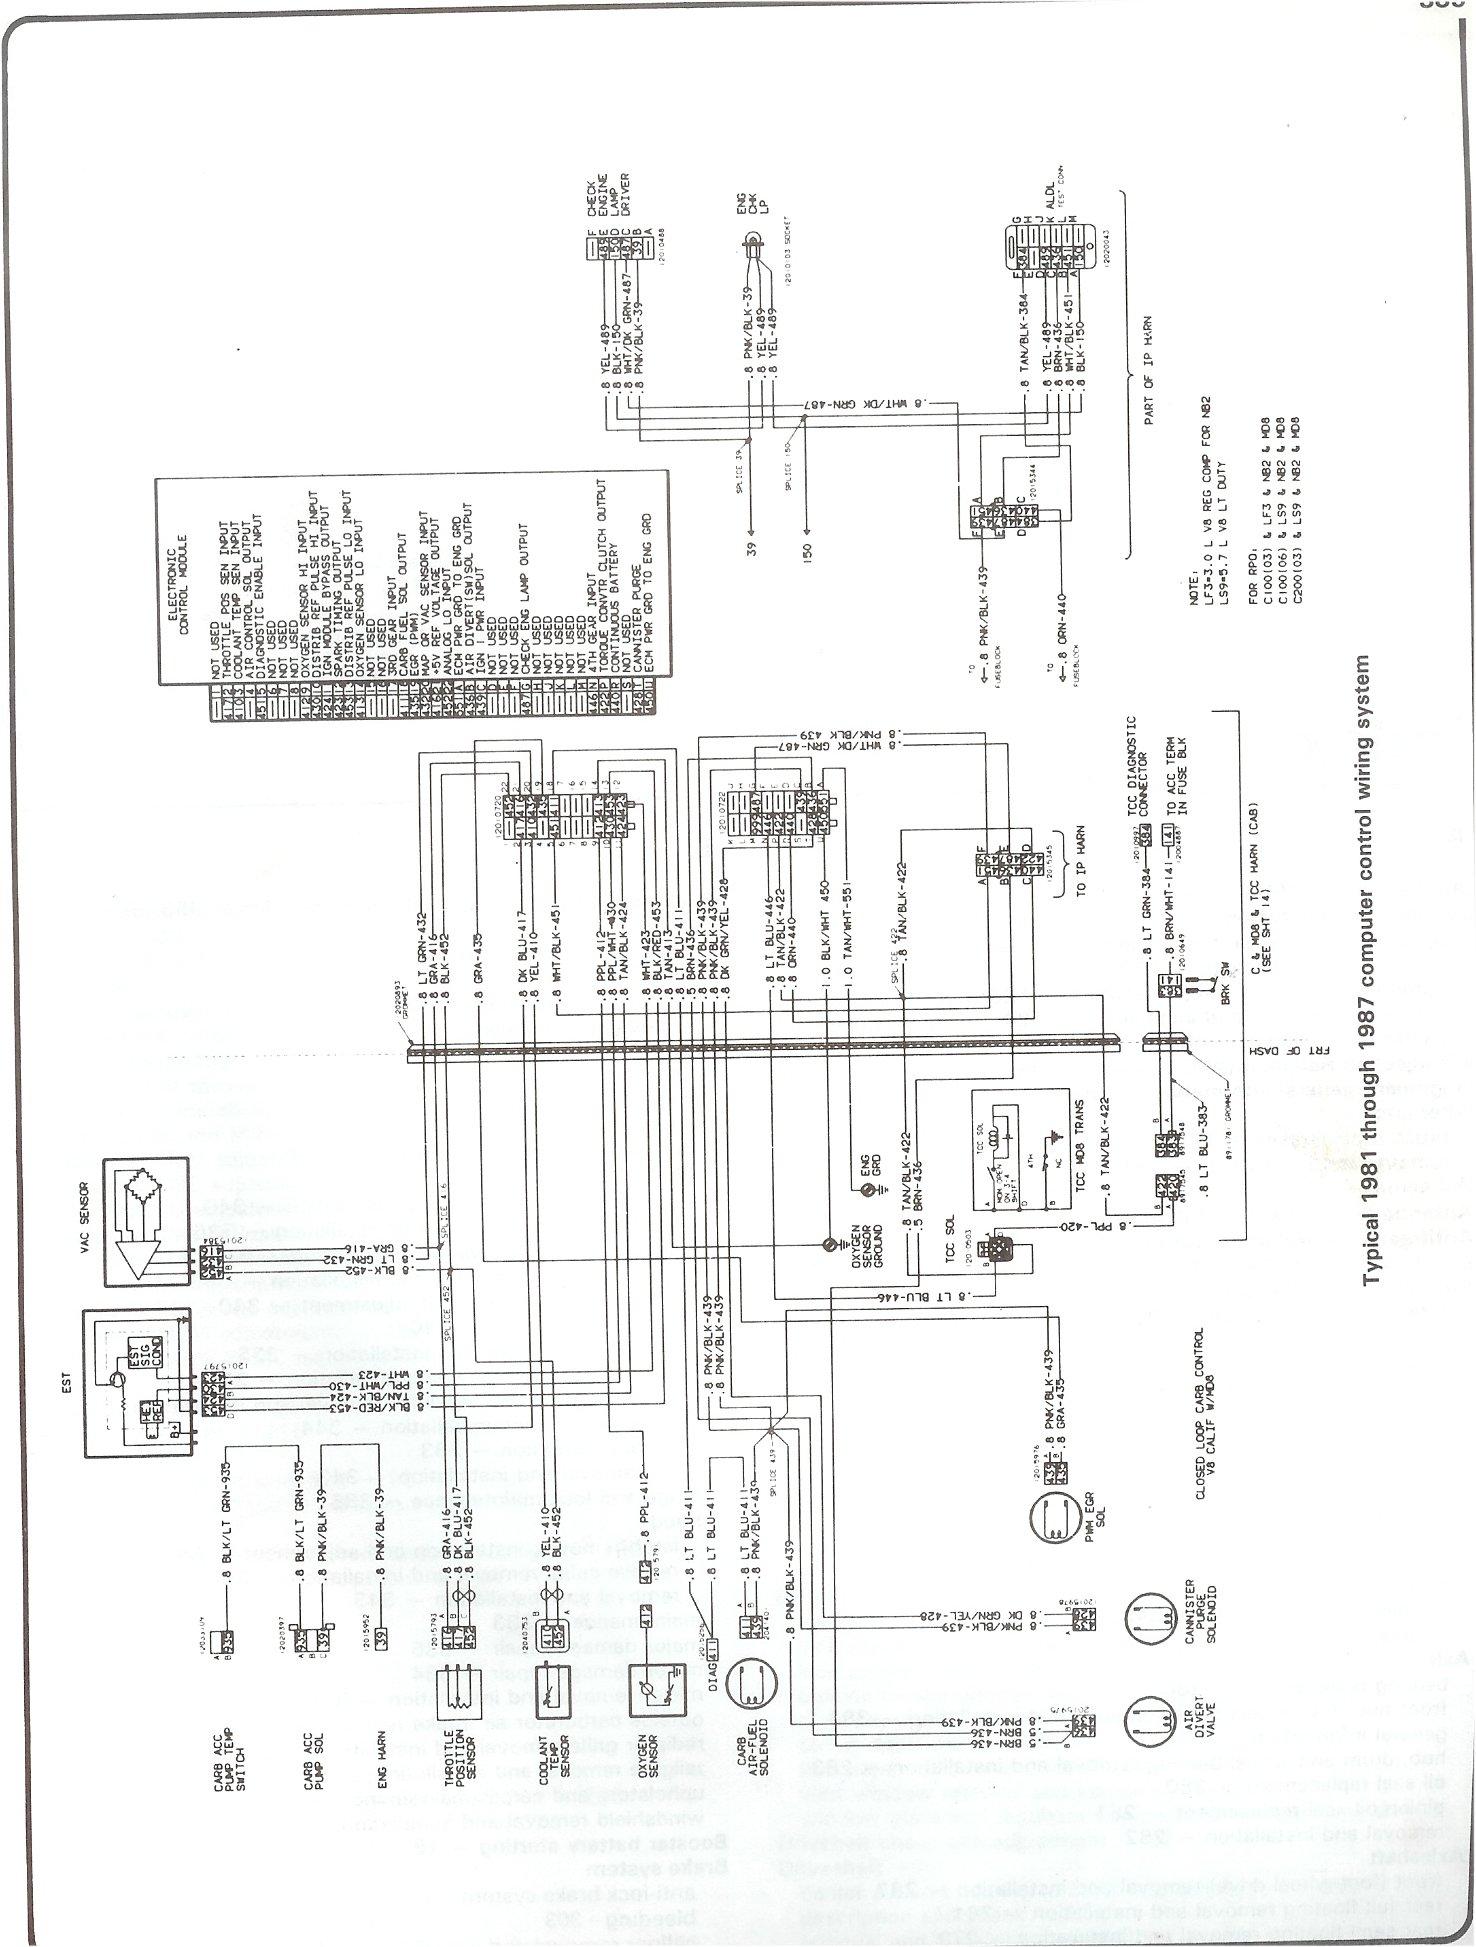 27 Chevy Truck Wiring Diagram